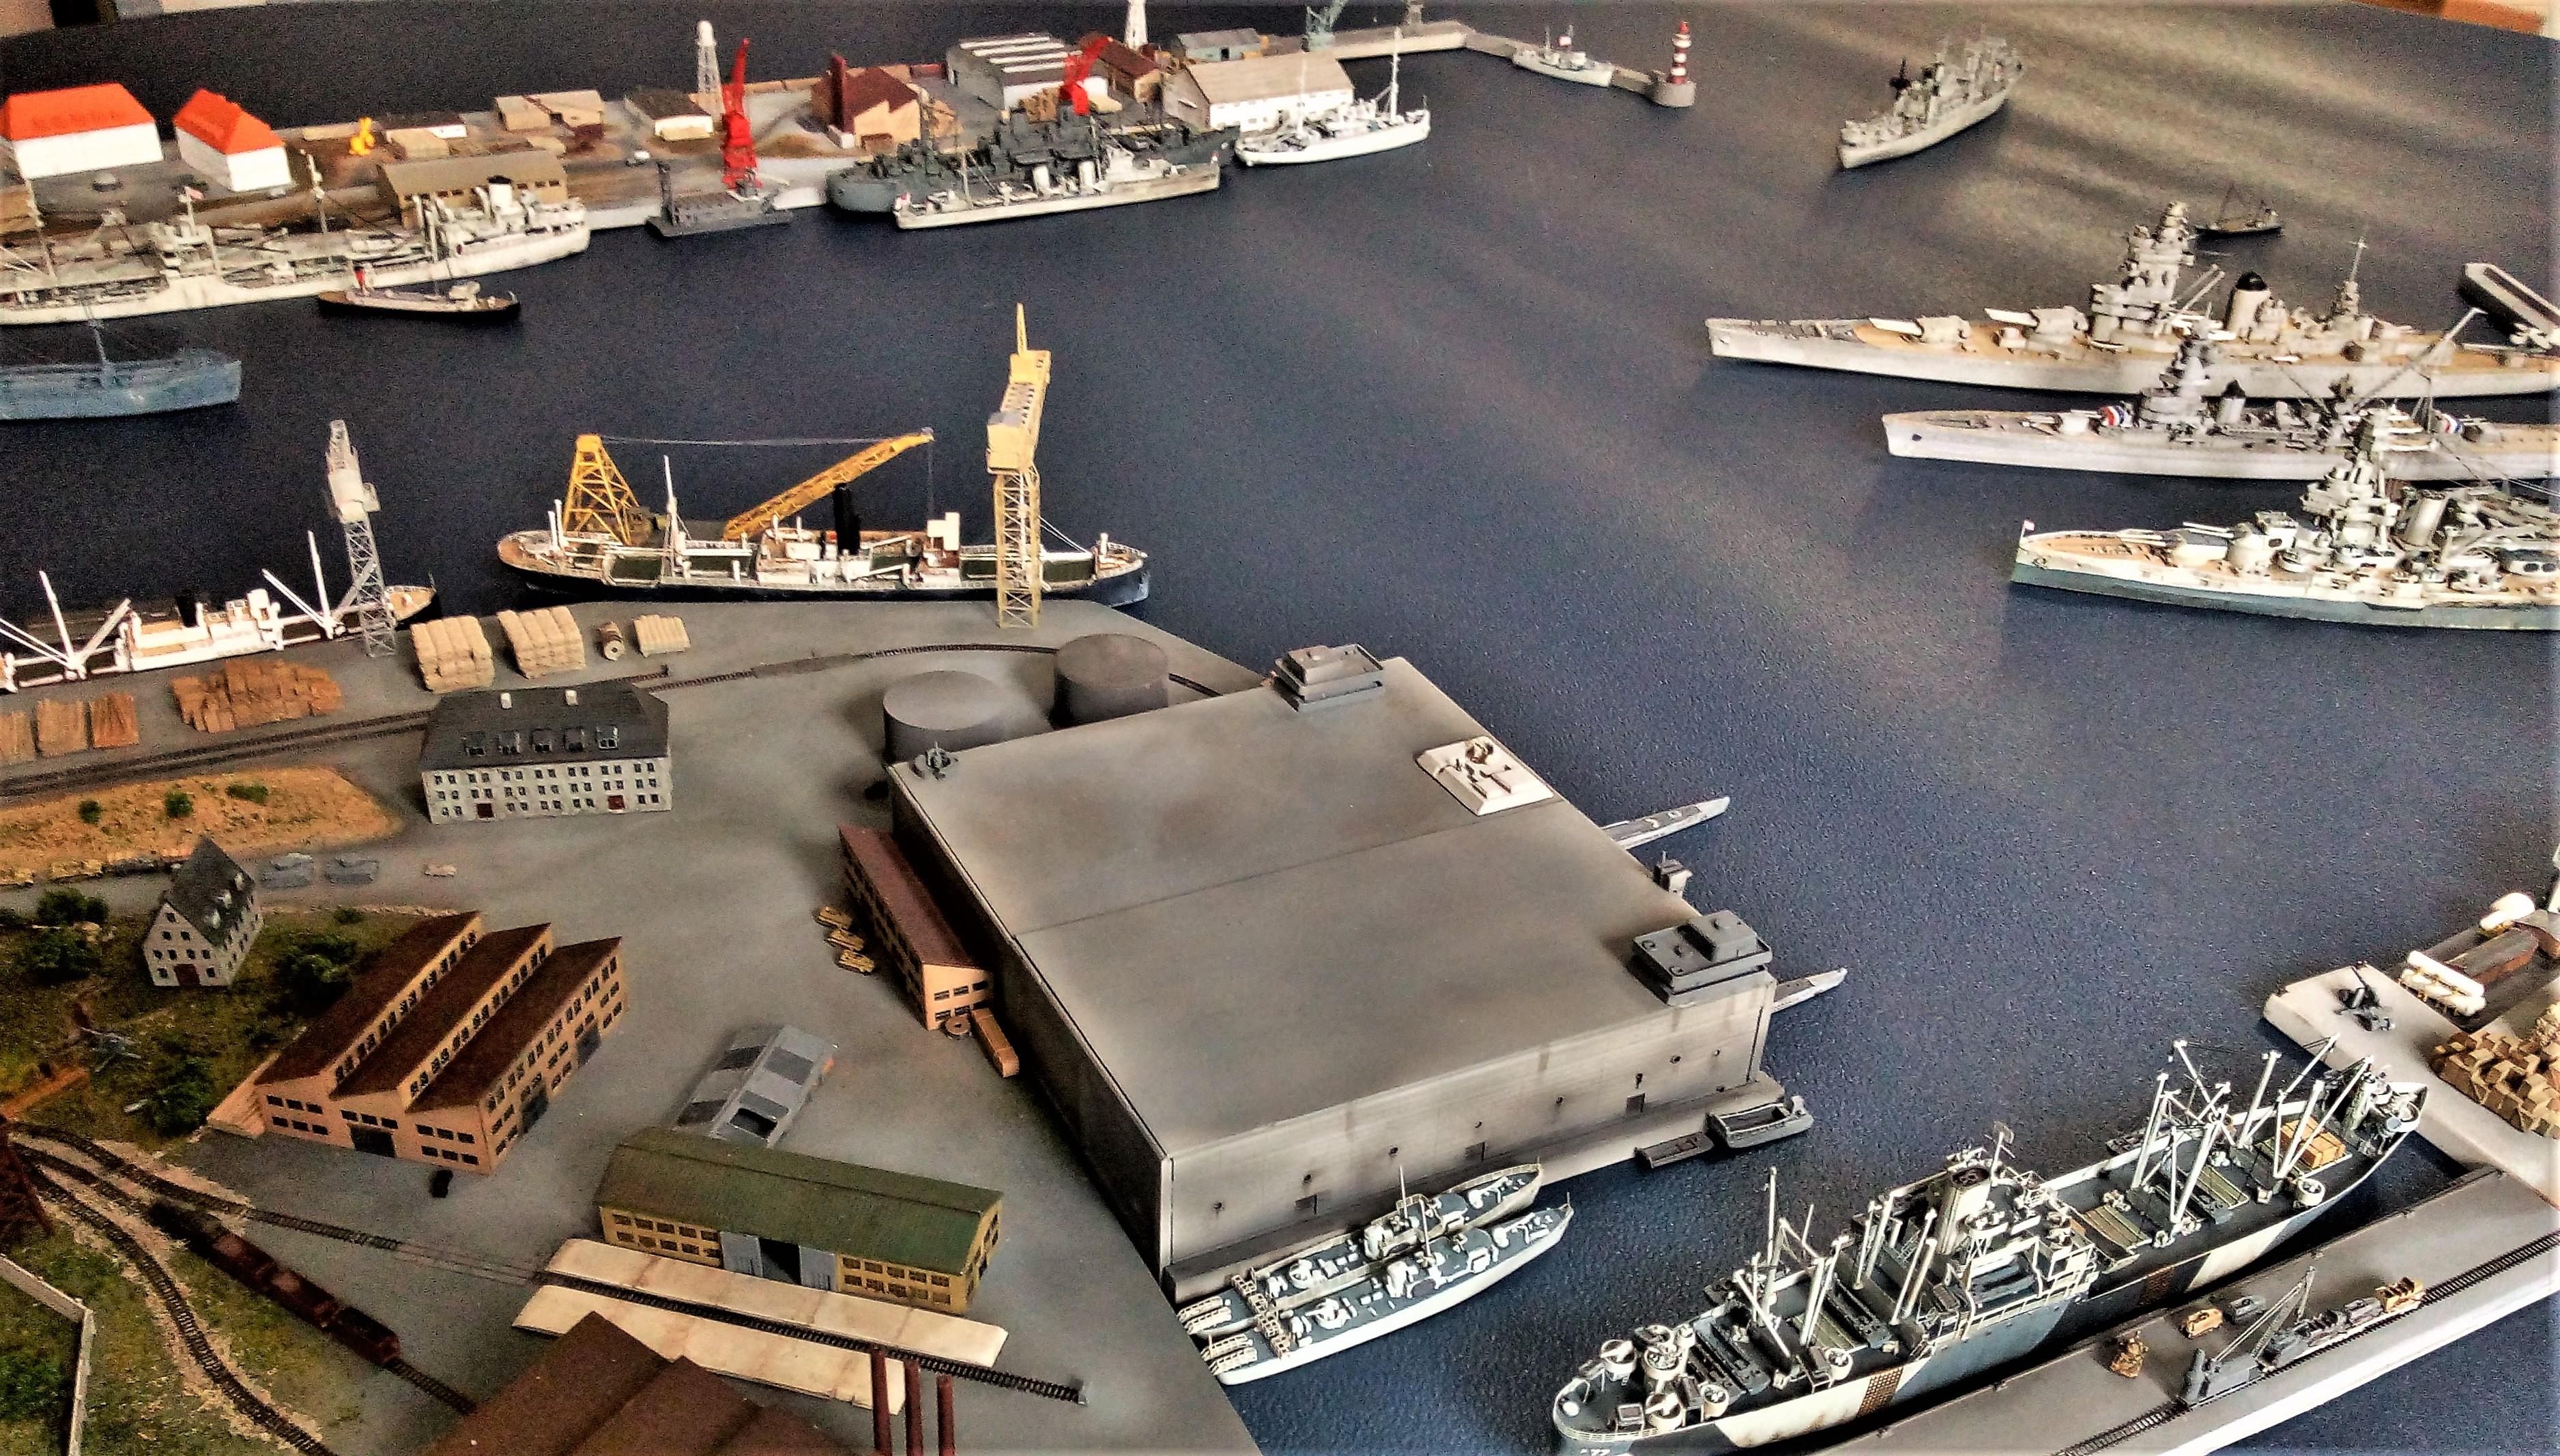 Diorama base navale 1/700 par Nesquik - Page 4 Z3SyHGLI